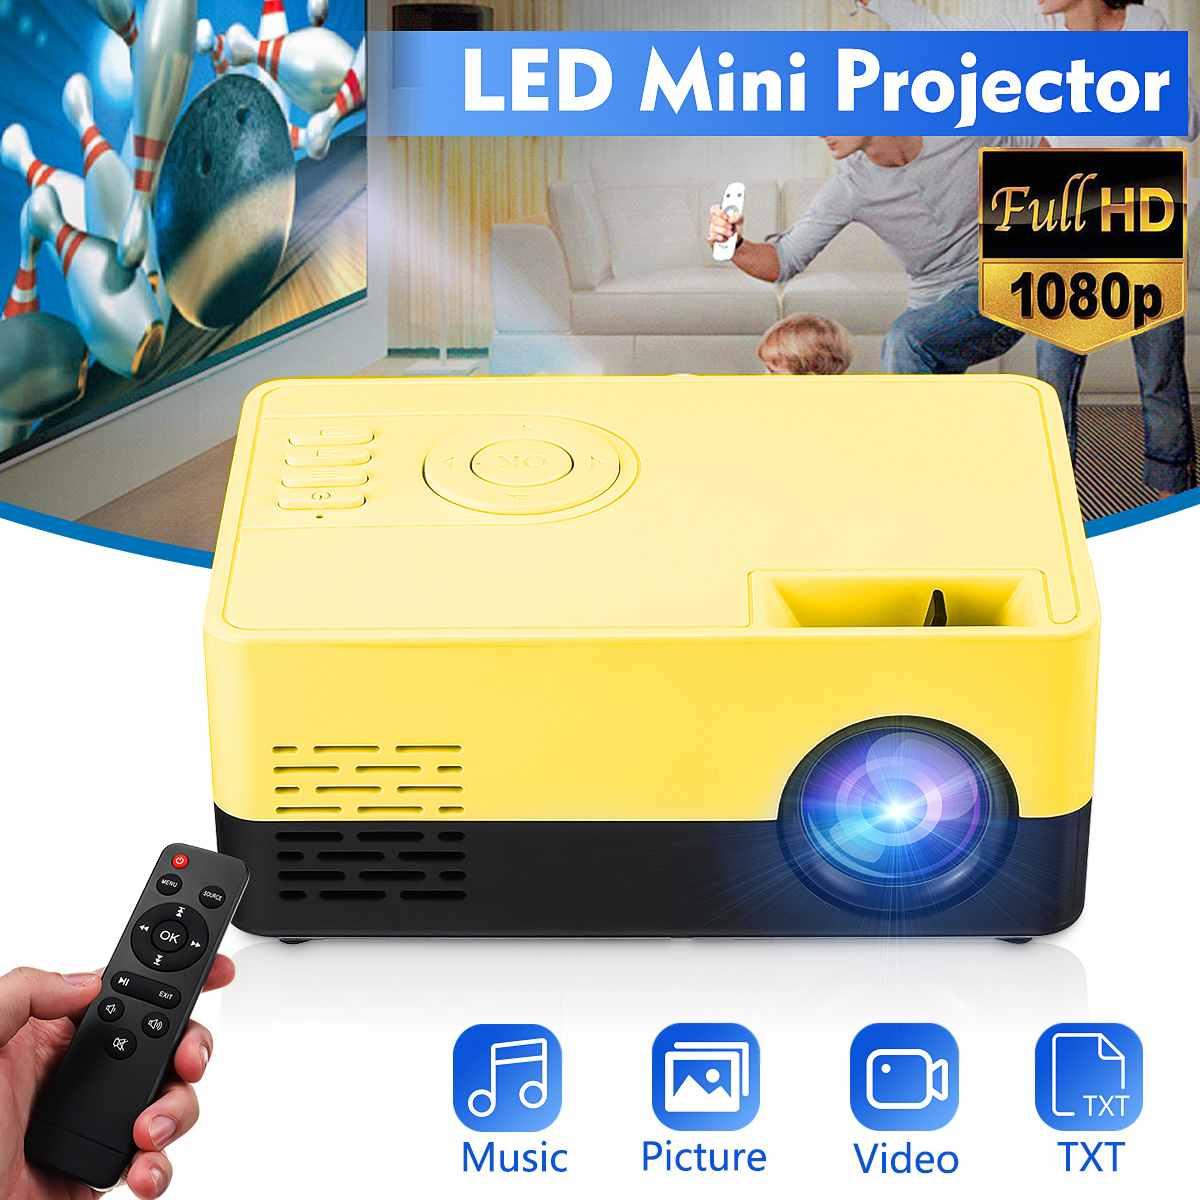 Mini proyector Full HD europeo 1080P proyector LED portátil Cine en Casa cine al aire libre película para fiesta Camping Para One plus 5T vidrio templado para OnePLus 3 3T Protector de pantalla 2.5D película de vidrio protectora completa para OnePlus 5 5T 1 + 5 t 6